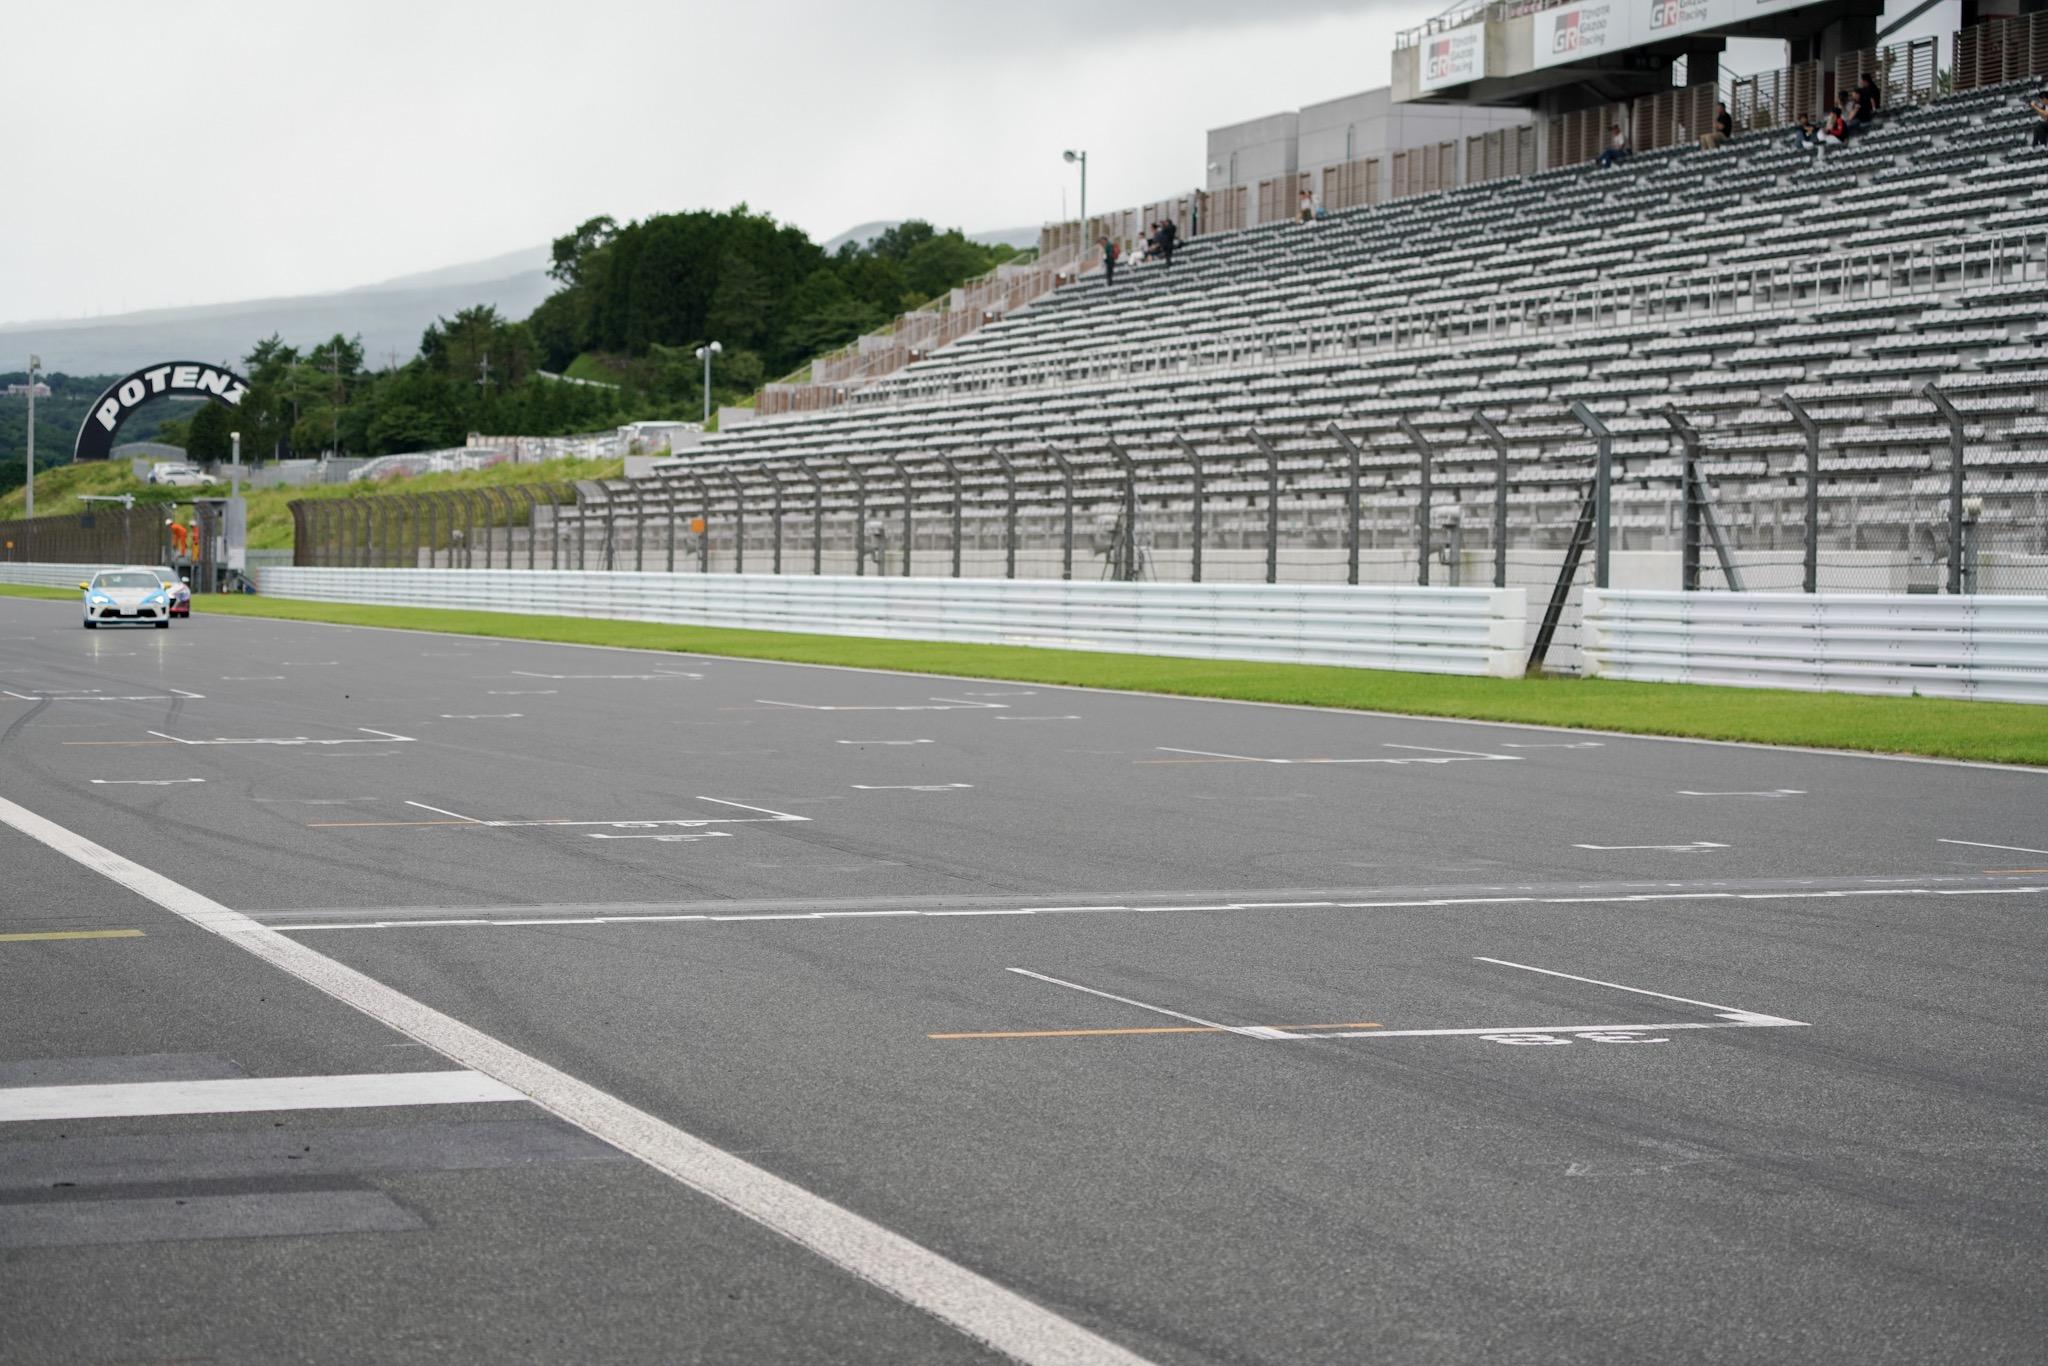 86/BRZレース・プロフェッショナルシリーズ第5戦